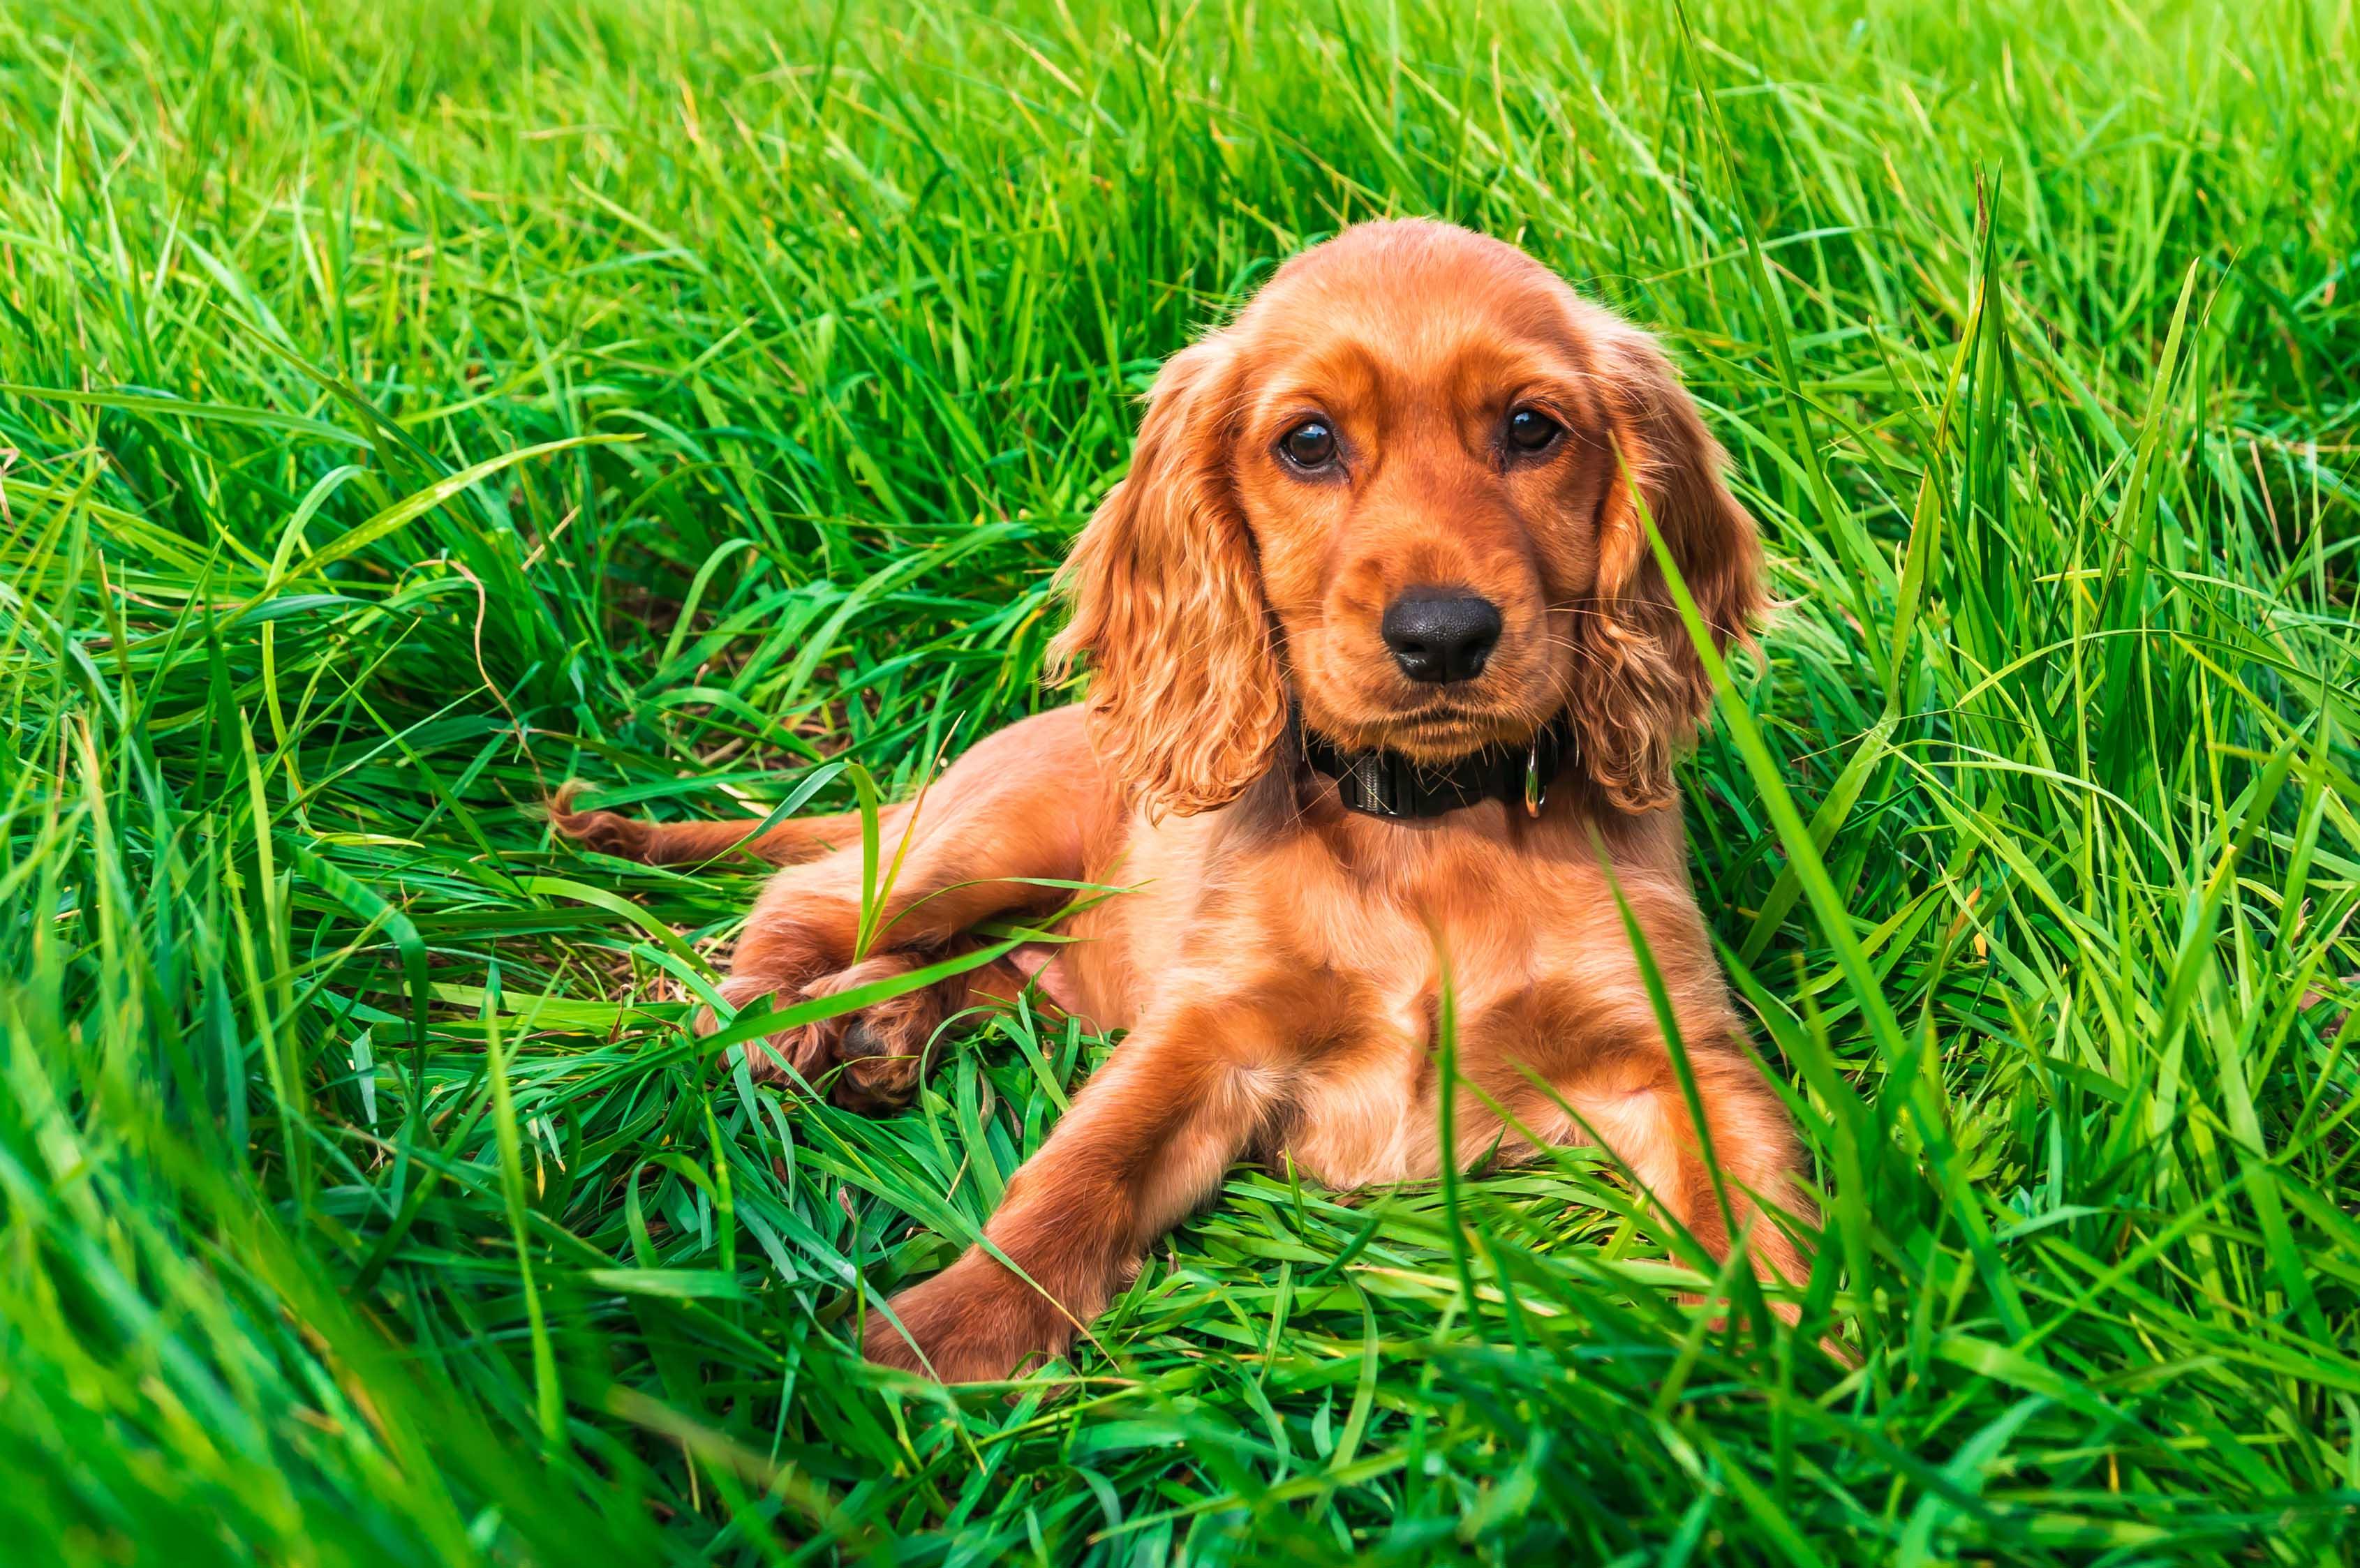 English cocker spaniel puppy lying on the green grass